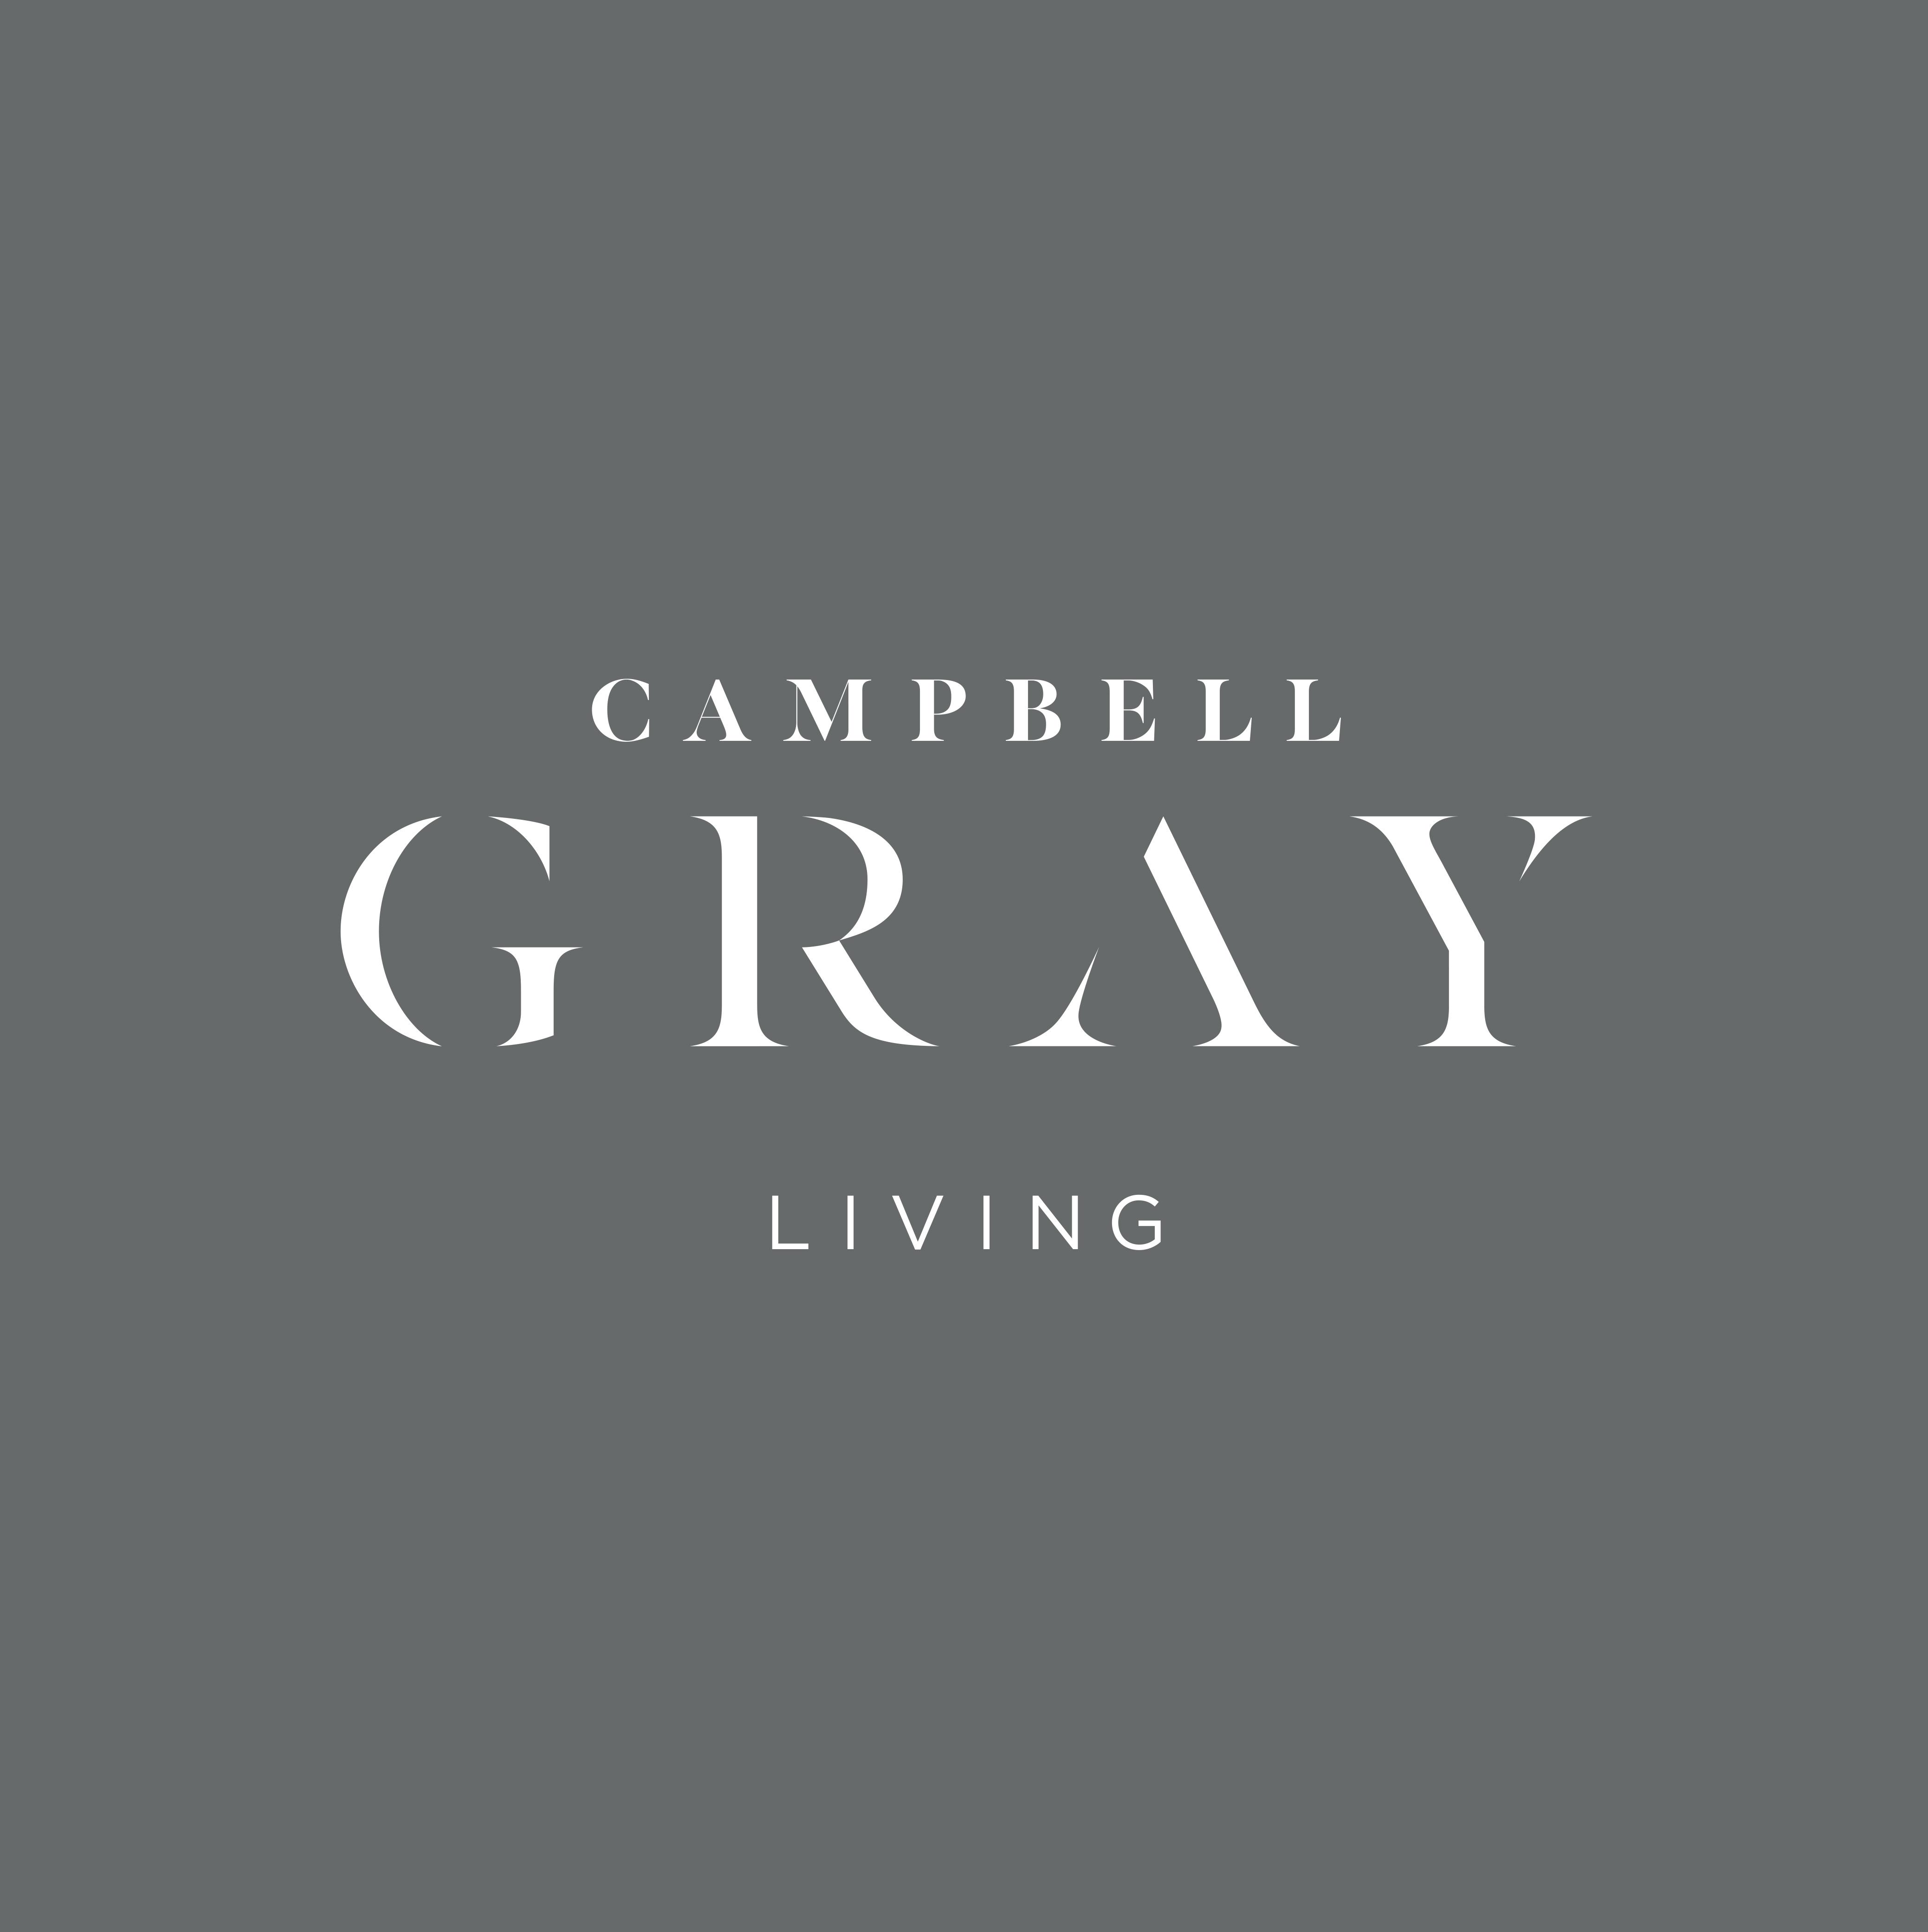 Campbell Gray Living Amman